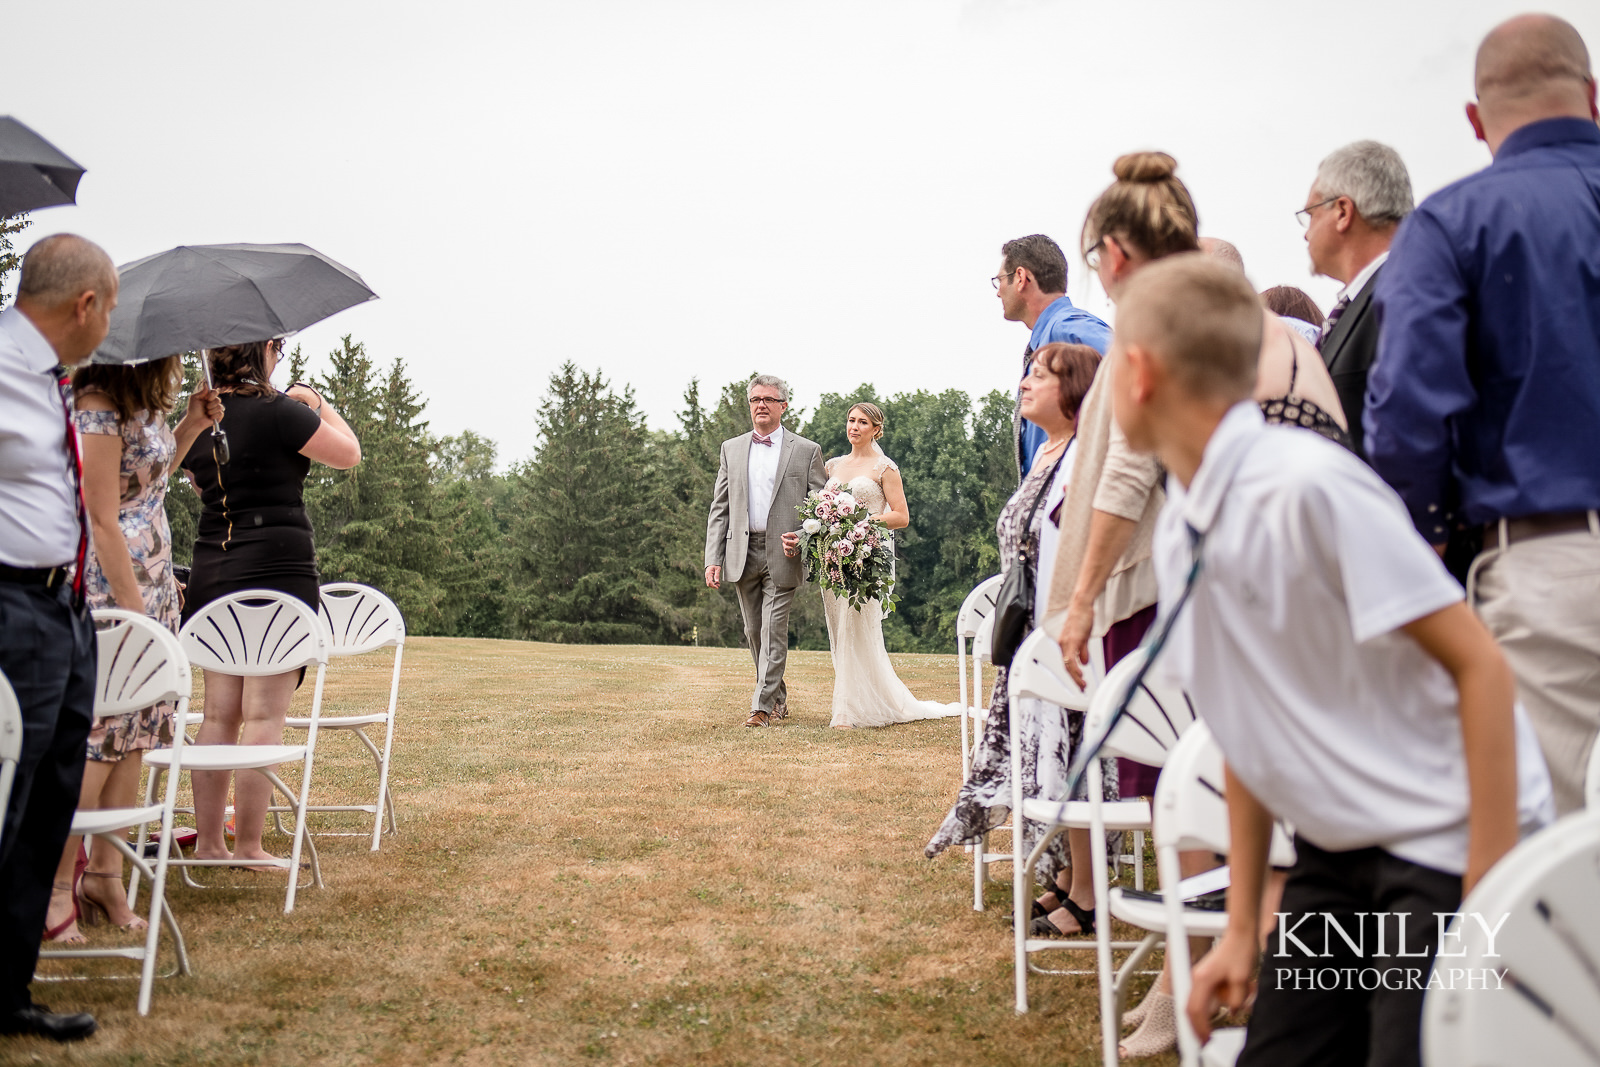 039 - Ontario Golf Club Wedding Pictures - XT2B8194.jpg